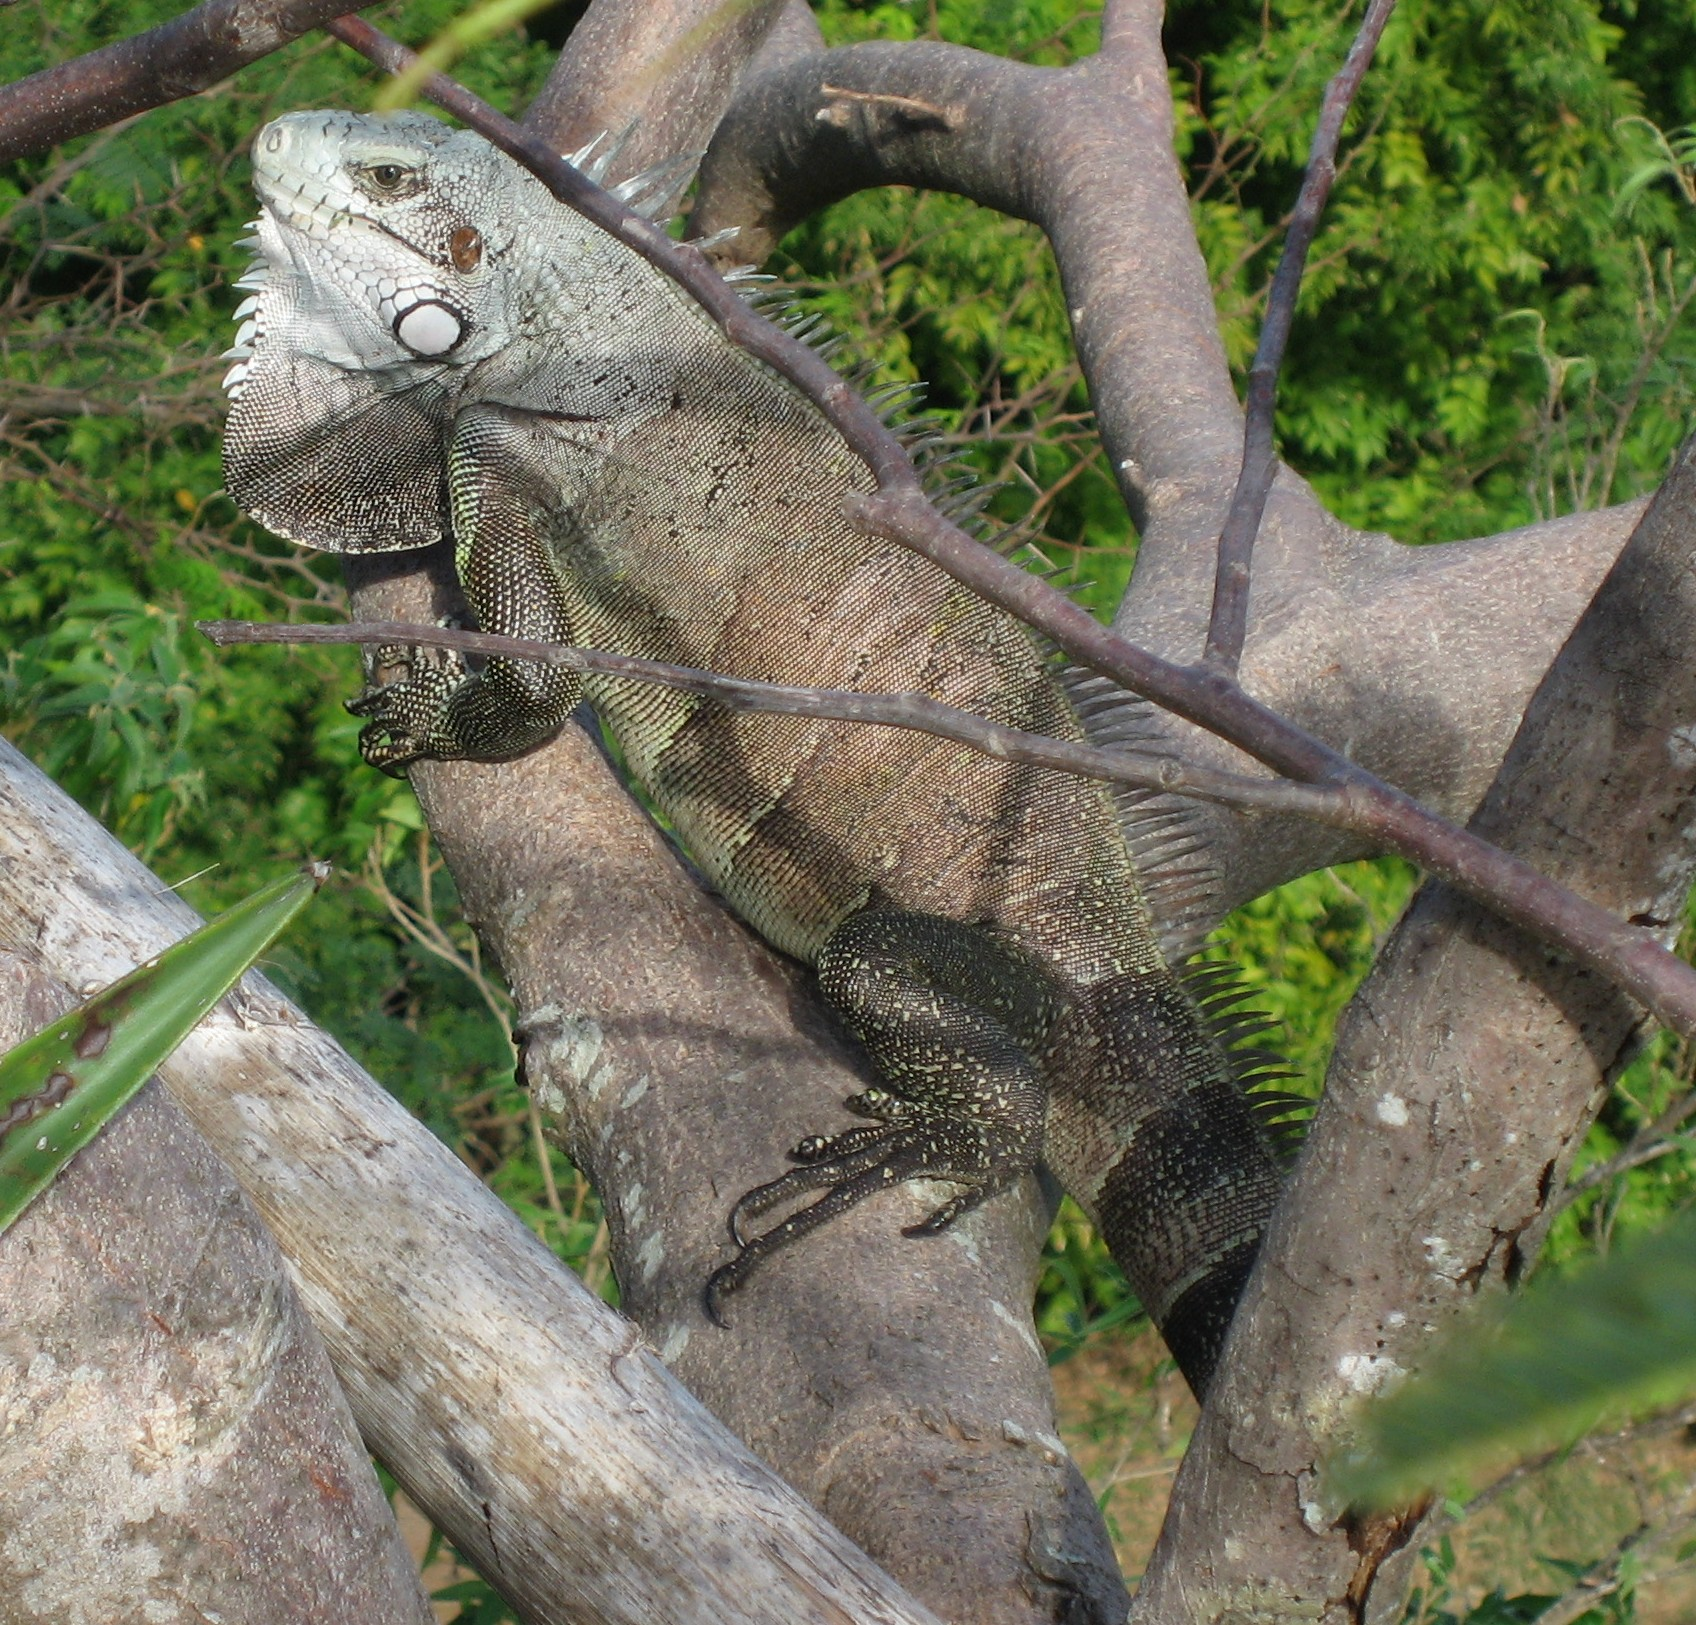 https://upload.wikimedia.org/wikipedia/commons/8/84/Iguana_iguana01.jpg